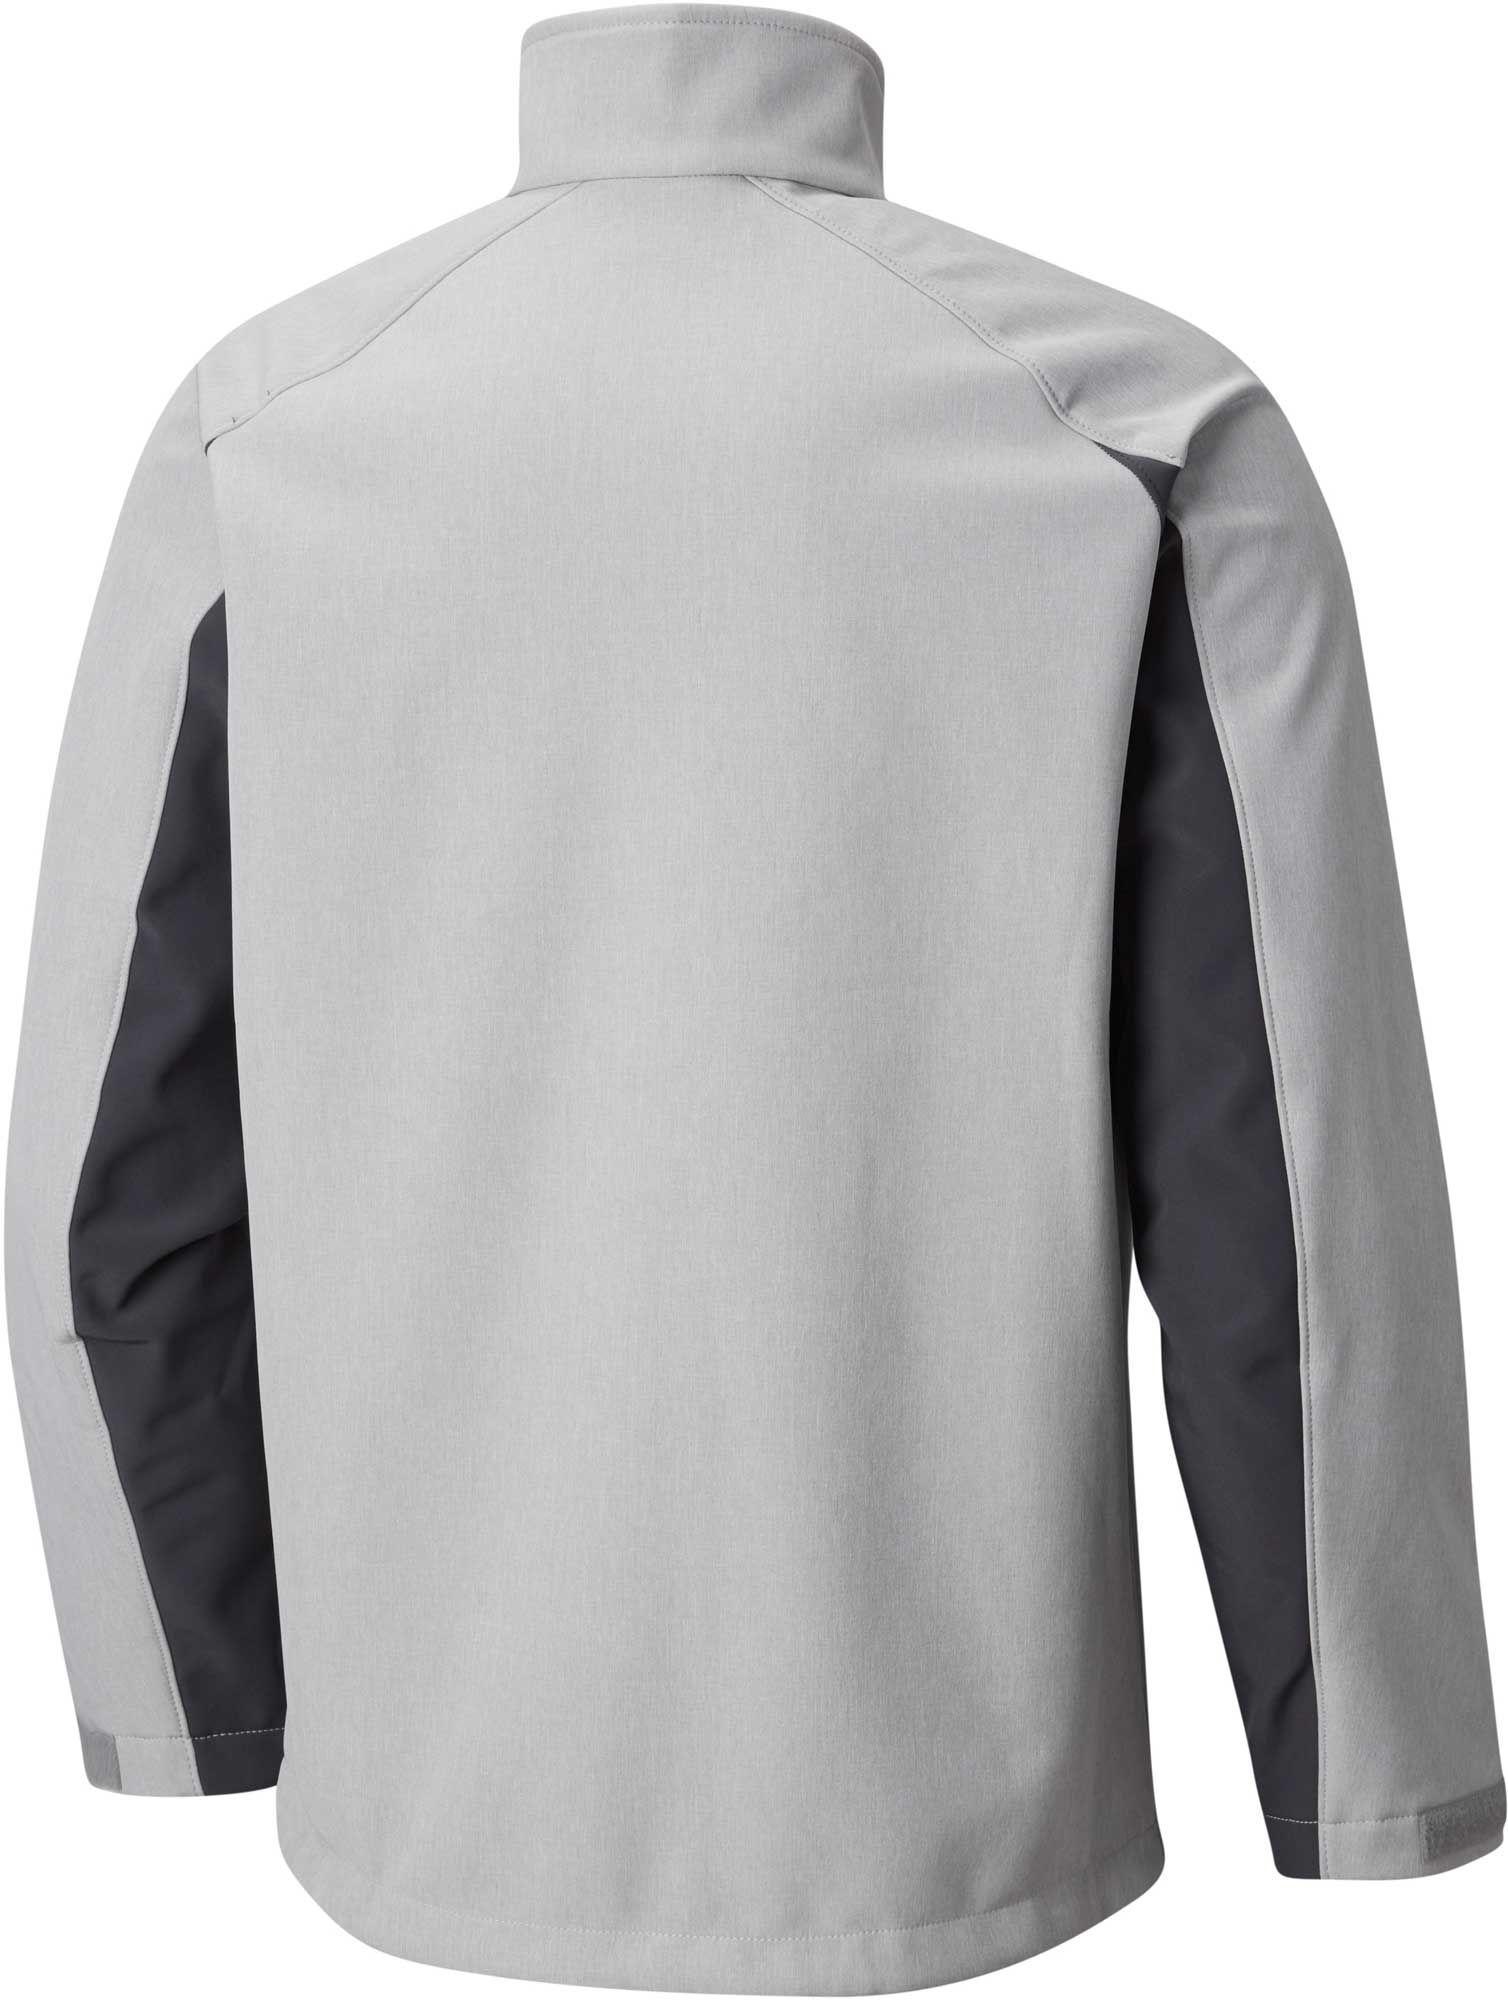 Lyst - Columbia Ryton Reserve Softshell Jacket in Gray for Men e19cdb1e11